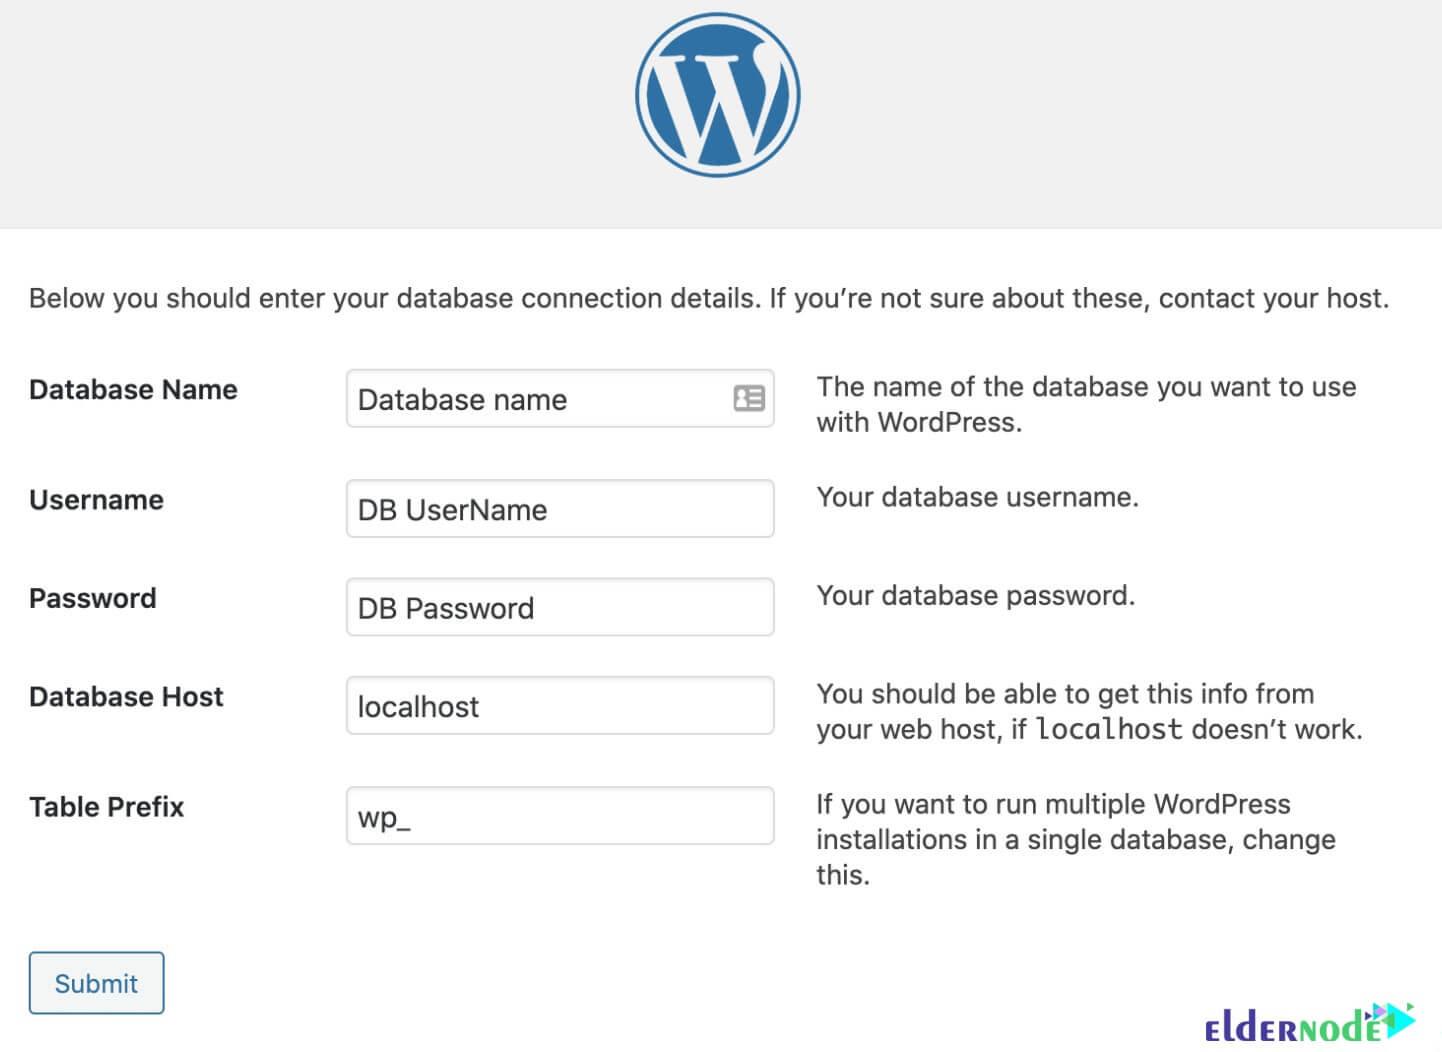 database information in wordpress installation